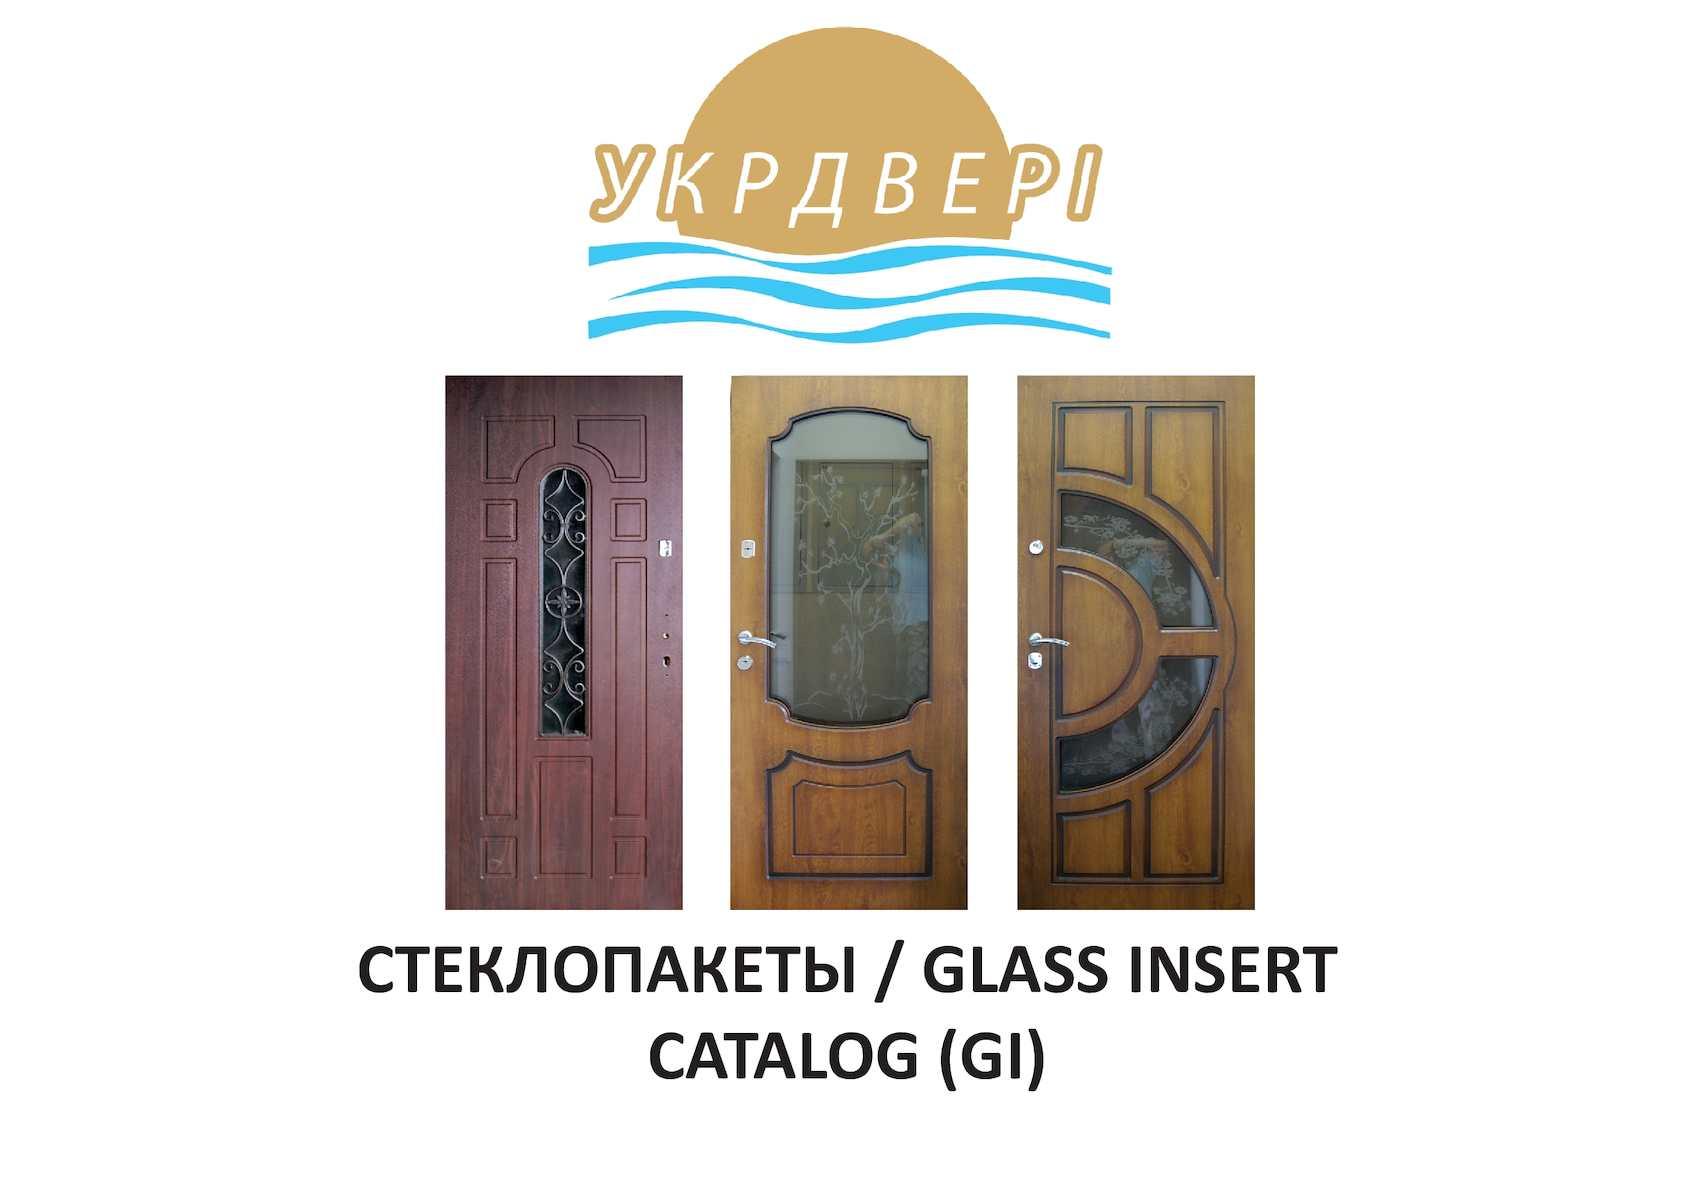 СТЕКЛОПАКЕТЫ  GLASS INSERT CATALOG (GI)